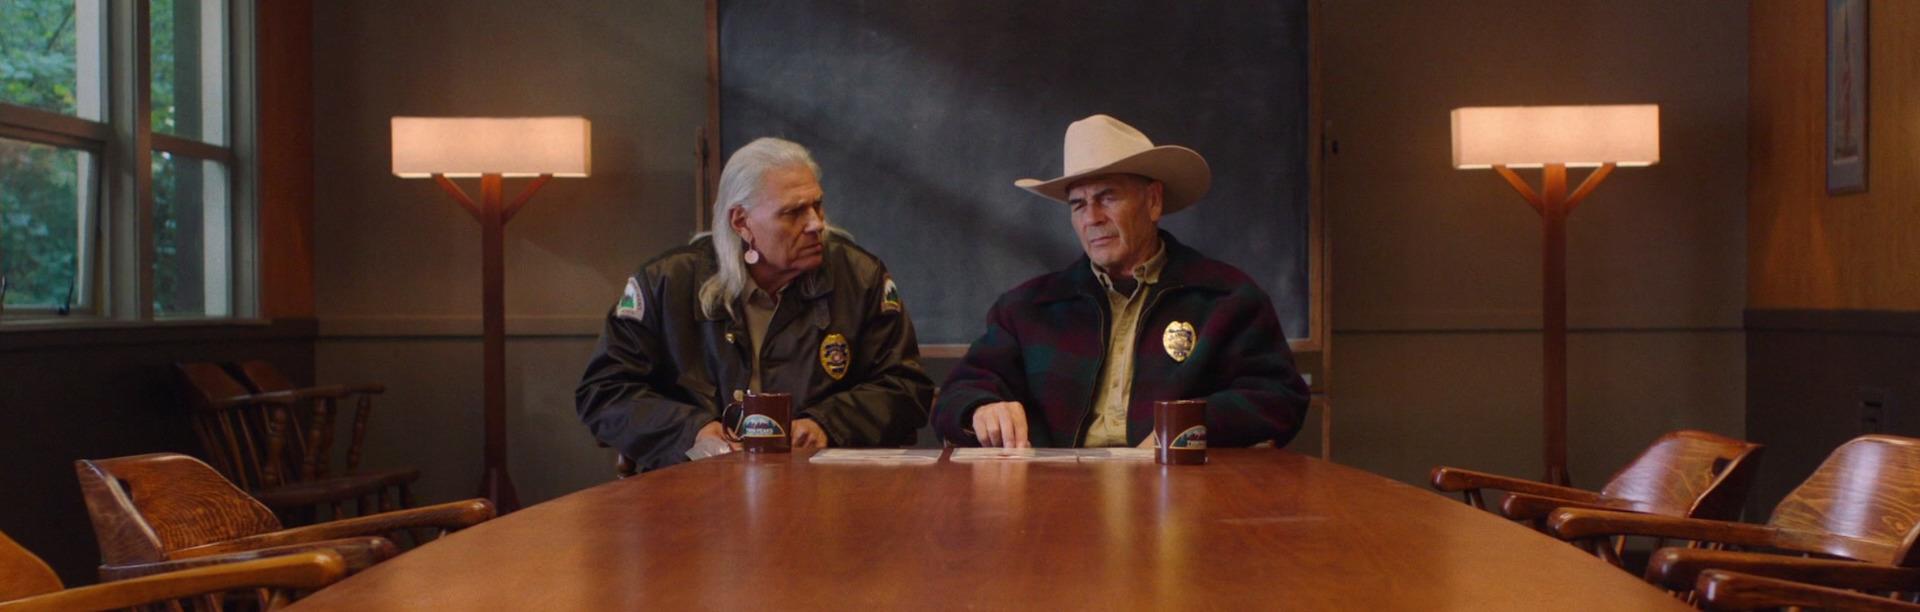 Twin Peaks Rewatch 41